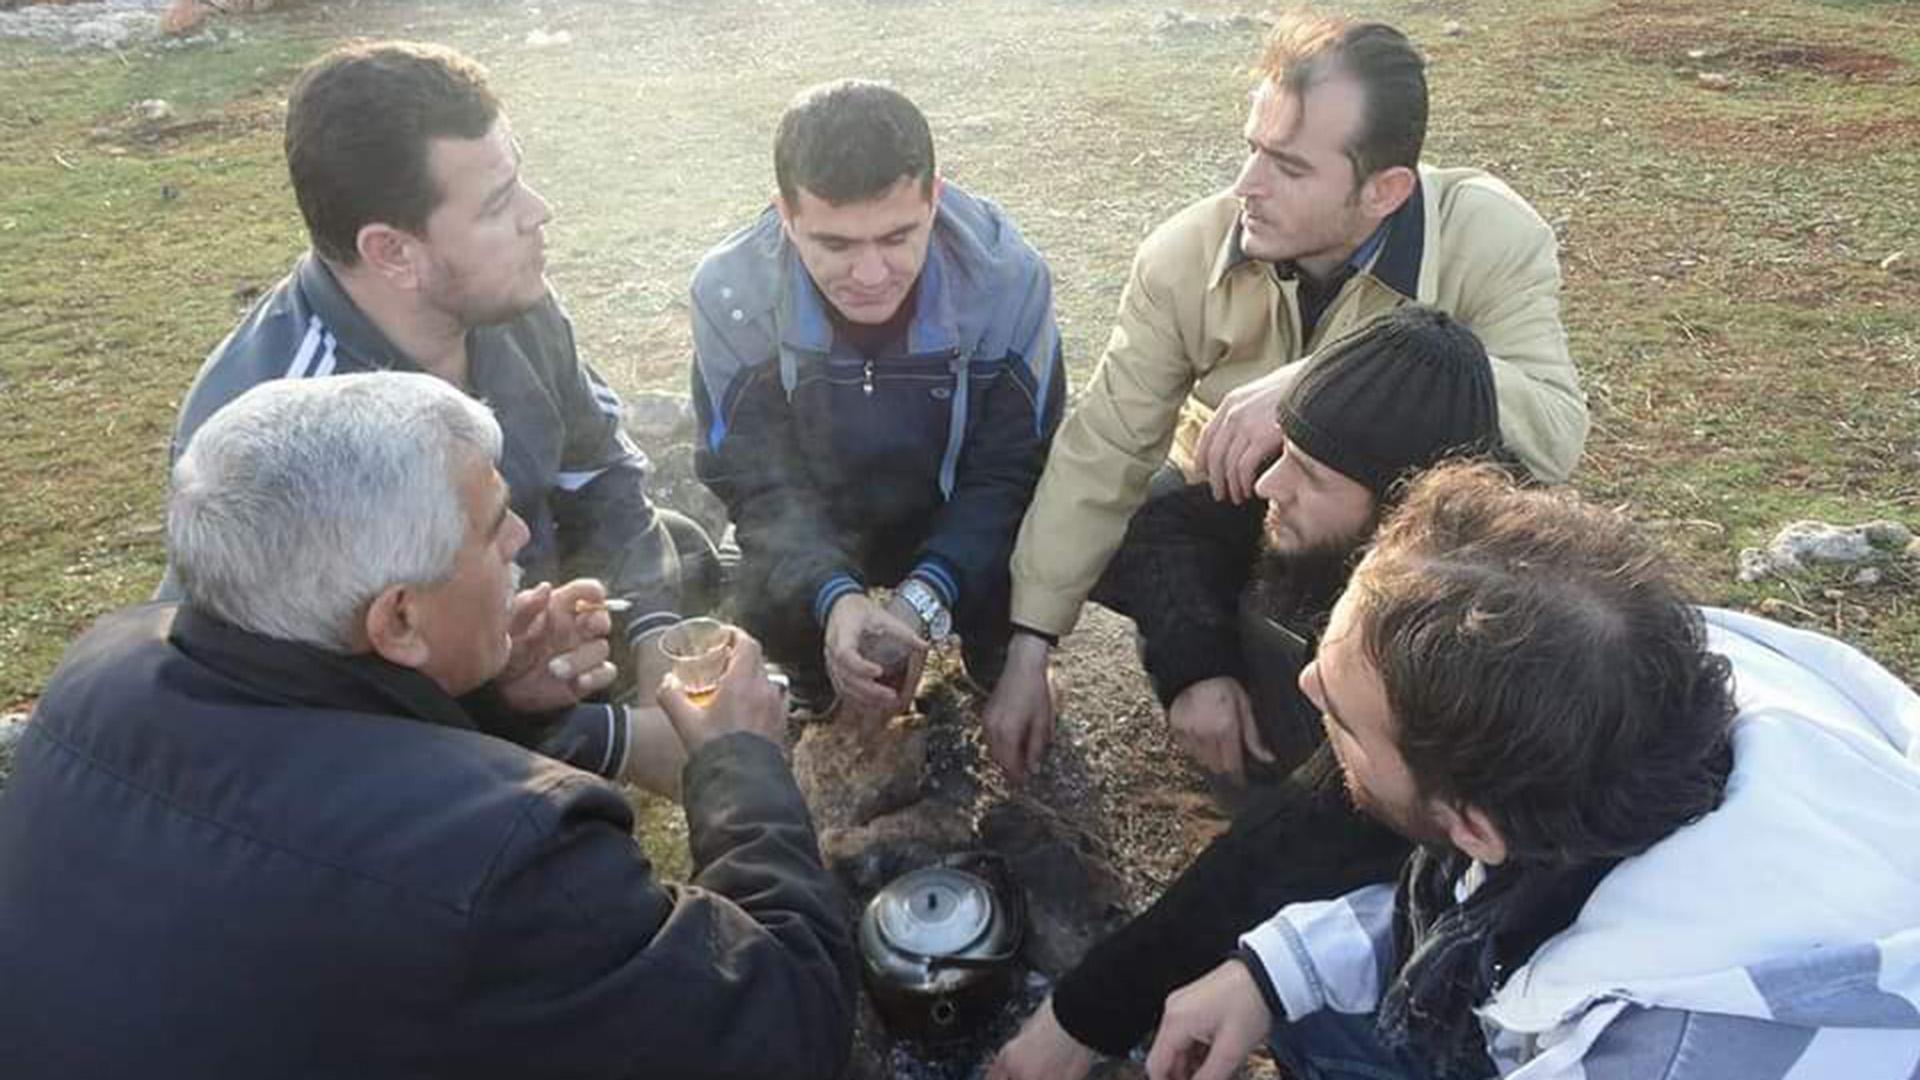 Photos - Idlib doctor first person [Photo courtesy of Dr Tarraf]